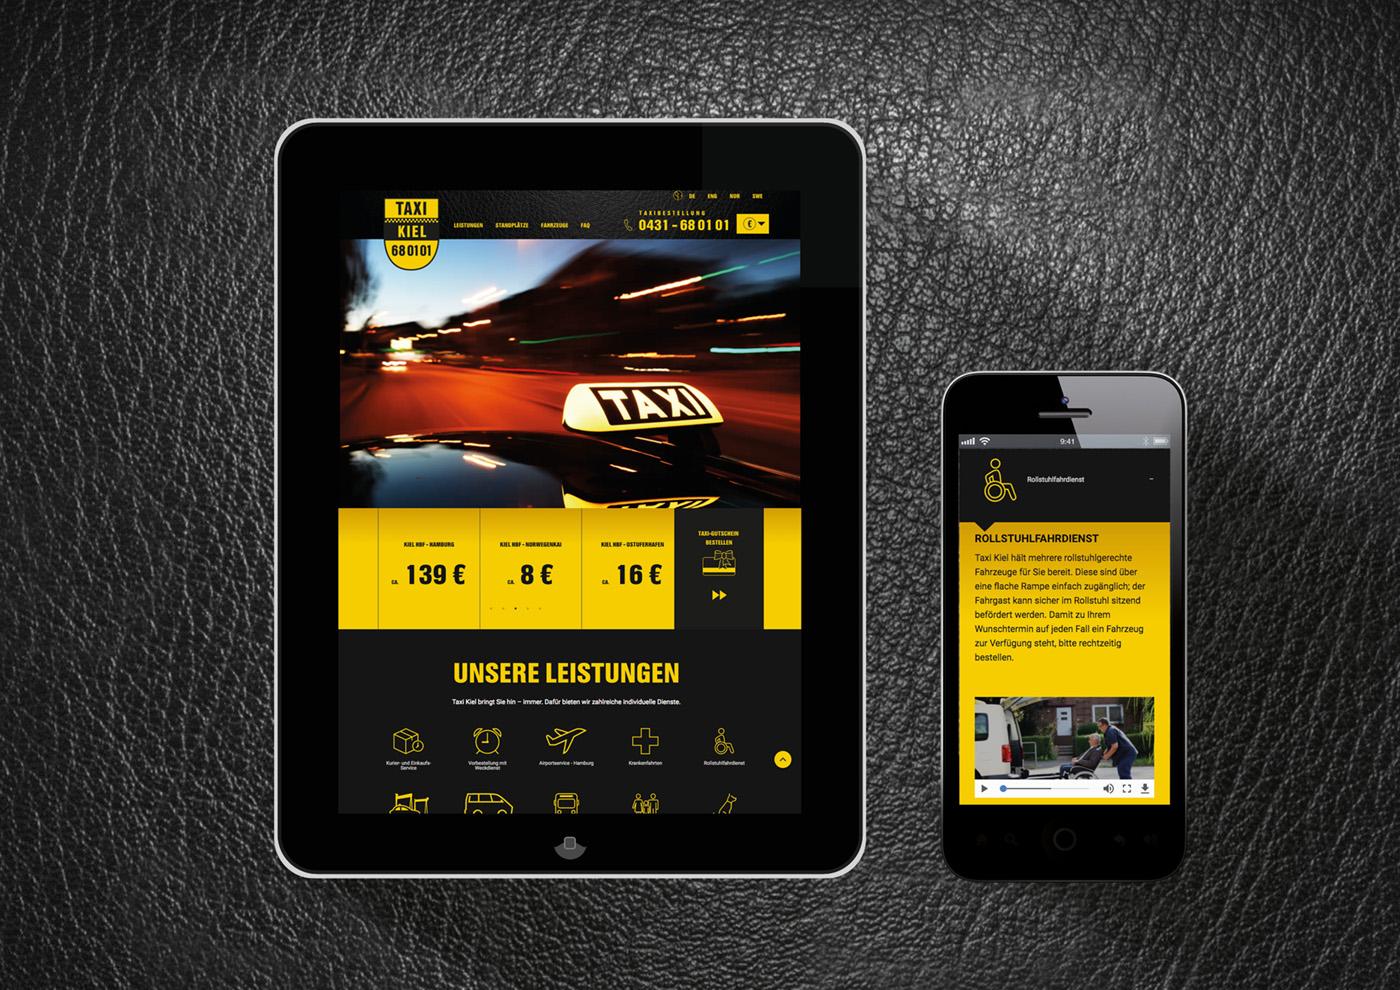 Web-Relaunch und Corporate Design für Taxi Kiel: Internet